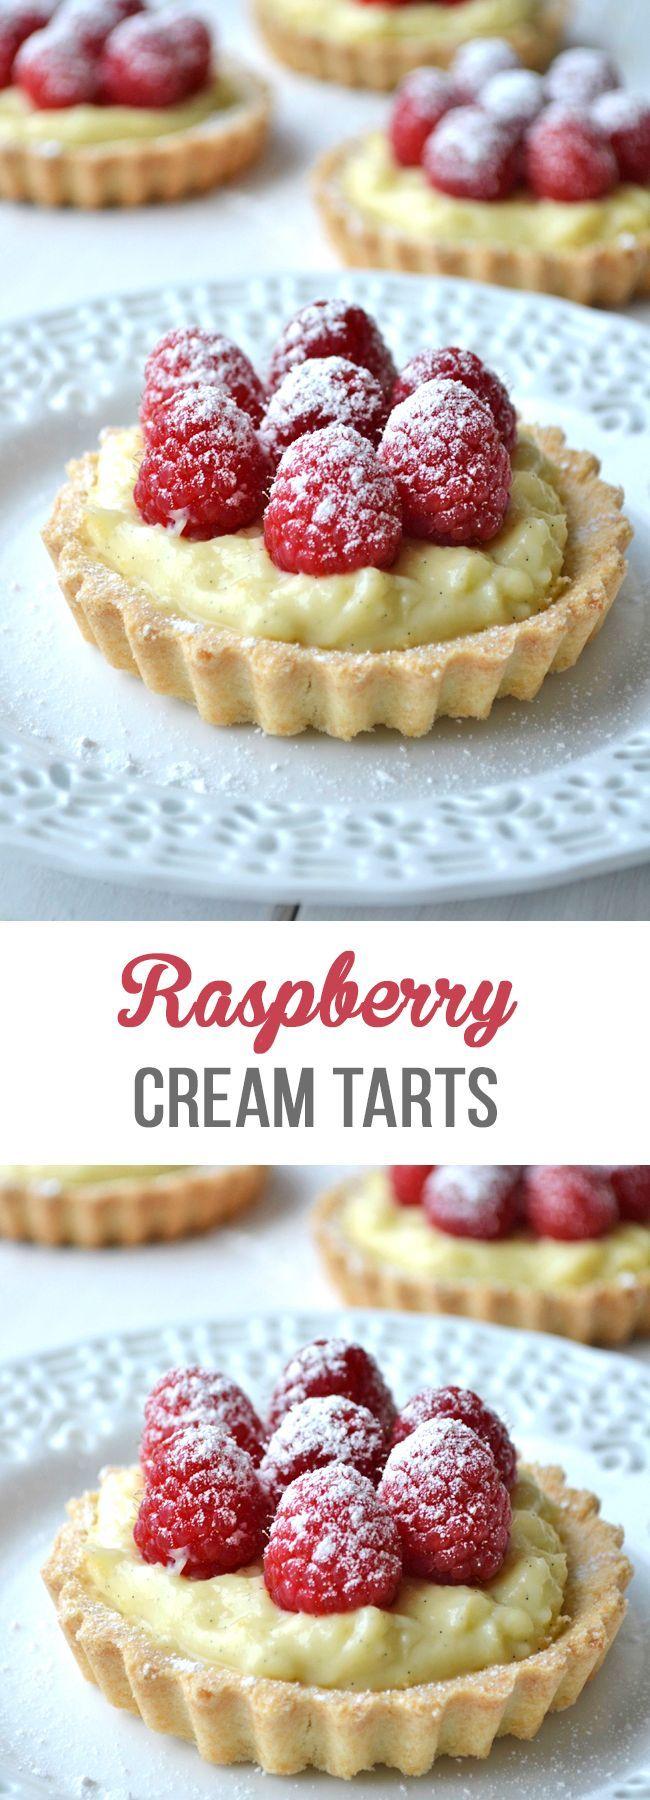 Delicious Raspberry & Vanilla Cream Tarts made with a shortbread crust, vanilla cream filling and fresh raspberries on top!